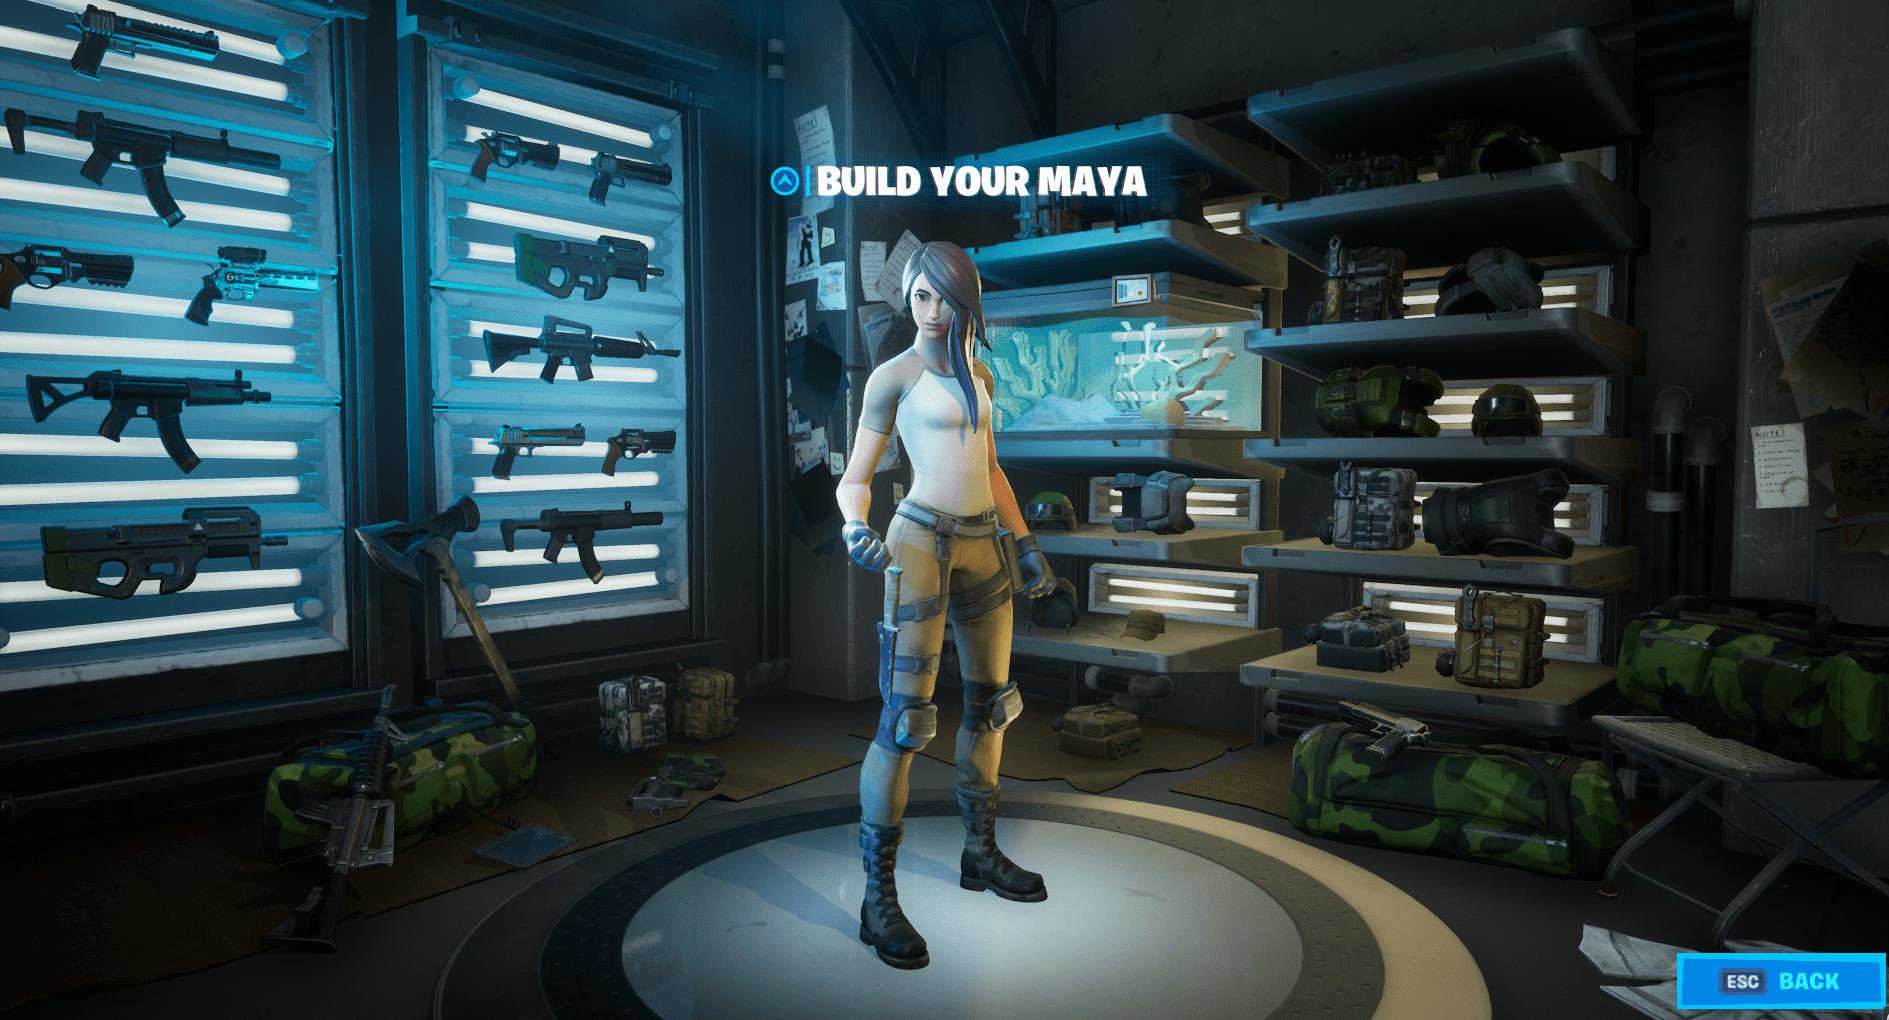 Build Your Maya Fortnite Skin